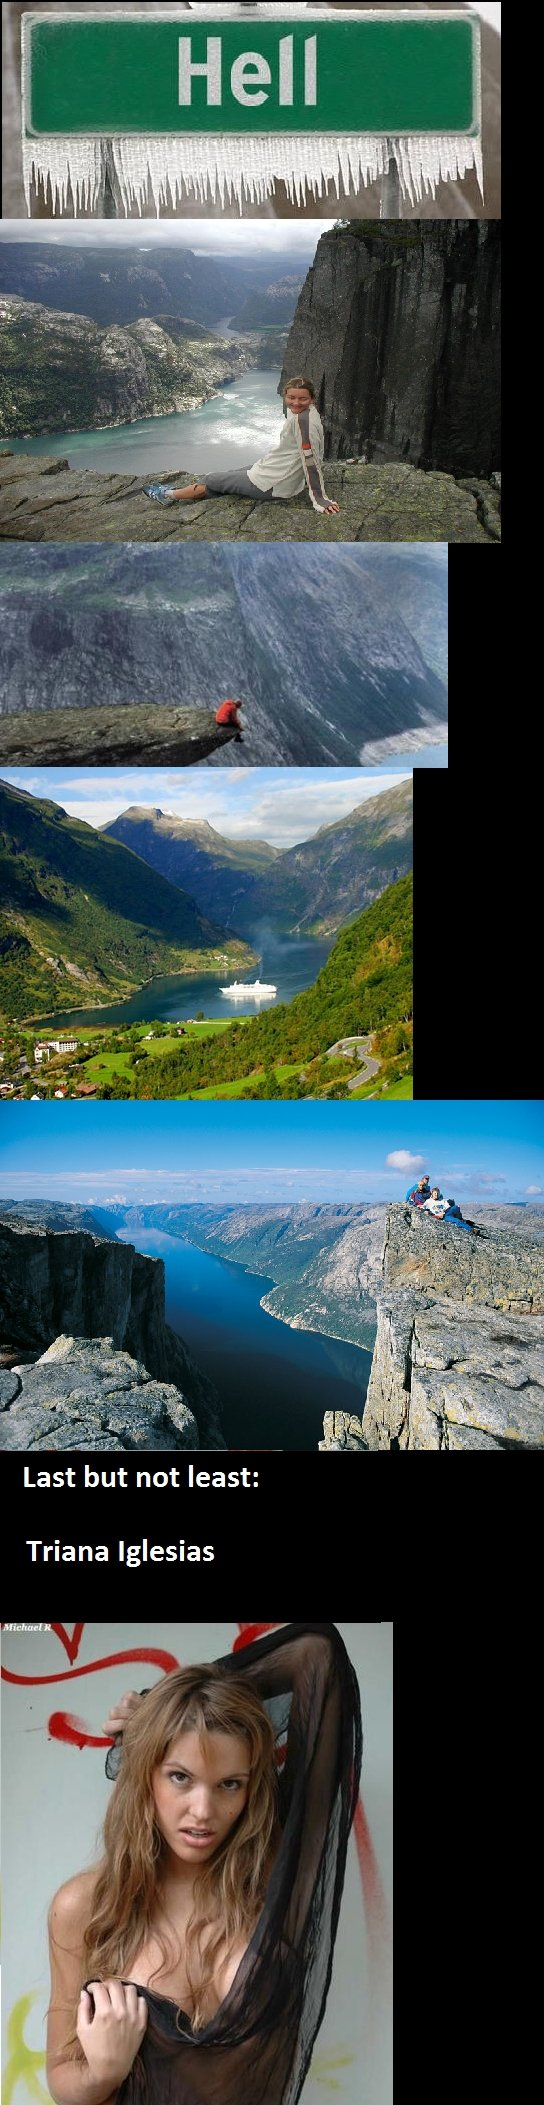 Norway. The greatest country in the world!.. goooooo Stjordal!